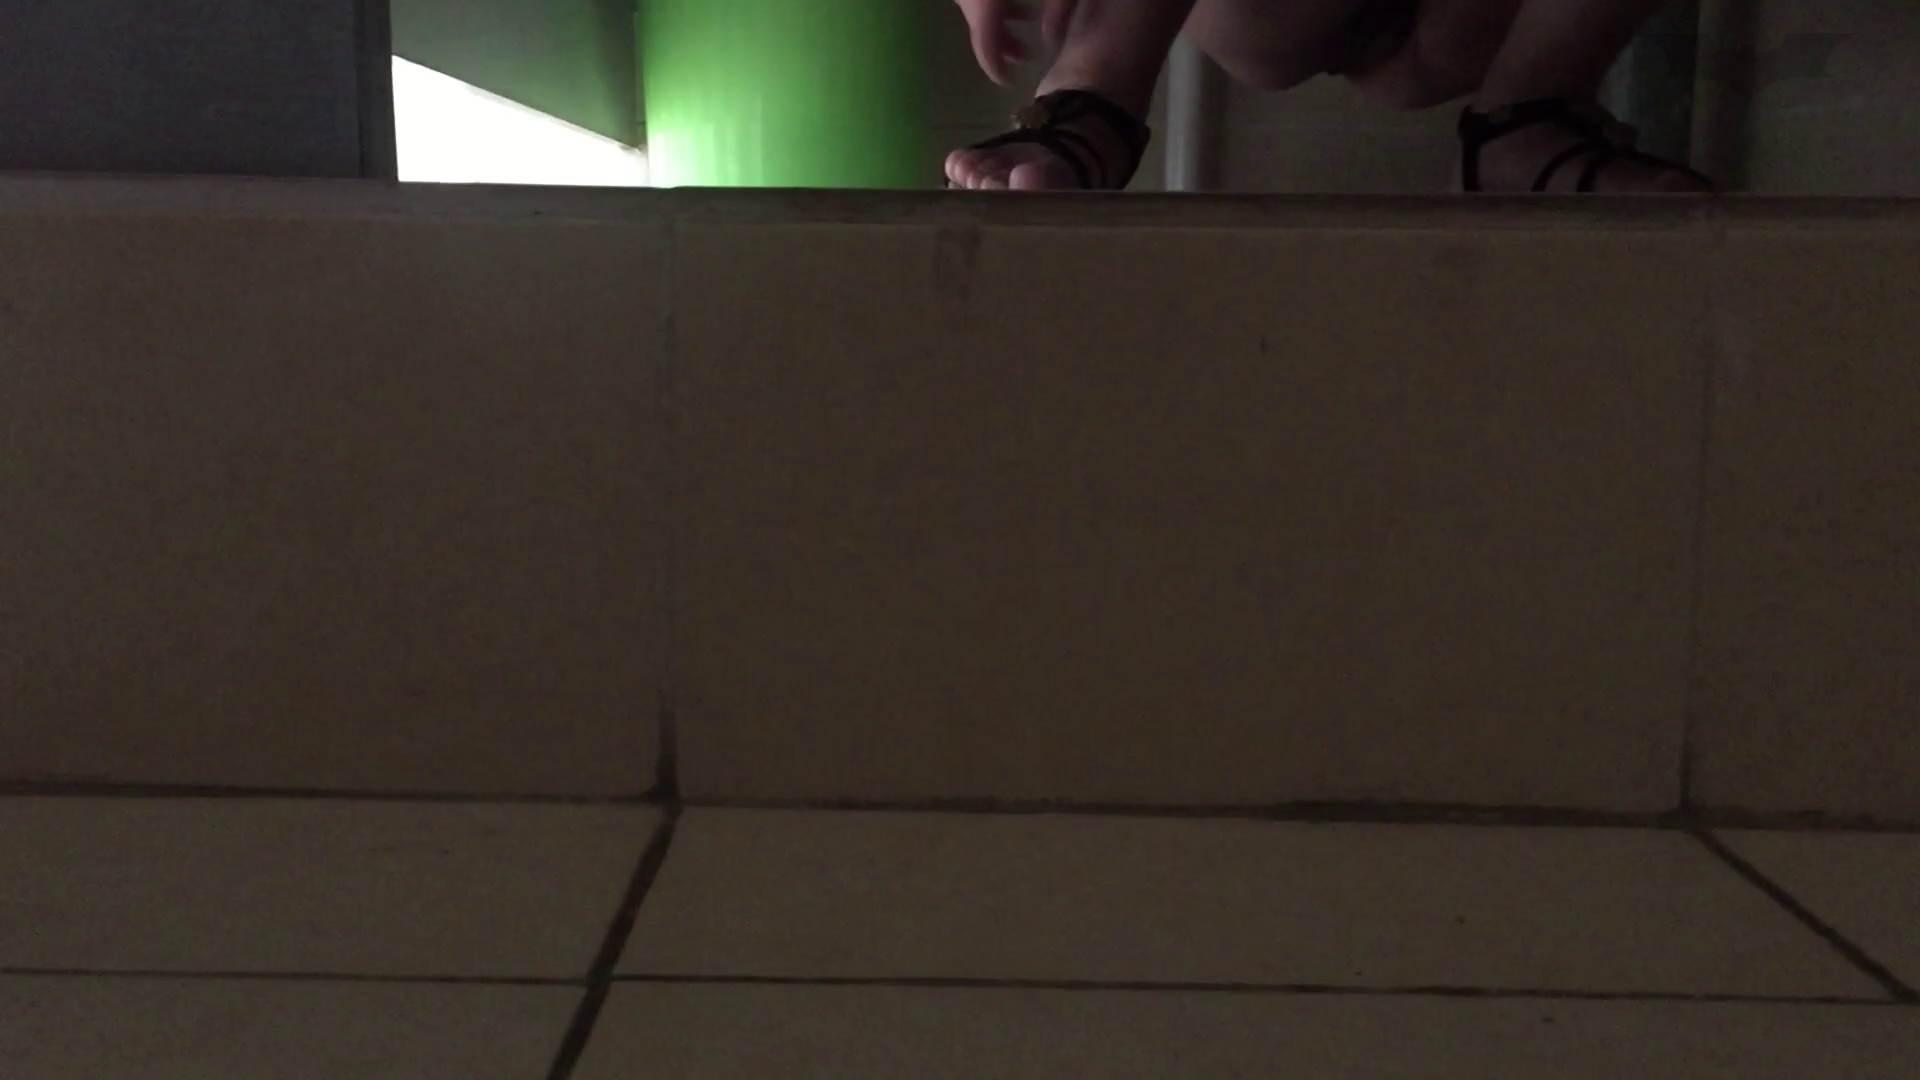 JD盗撮 美女の洗面所の秘密 Vol.73 盗撮・必見 AV無料動画キャプチャ 67画像 47